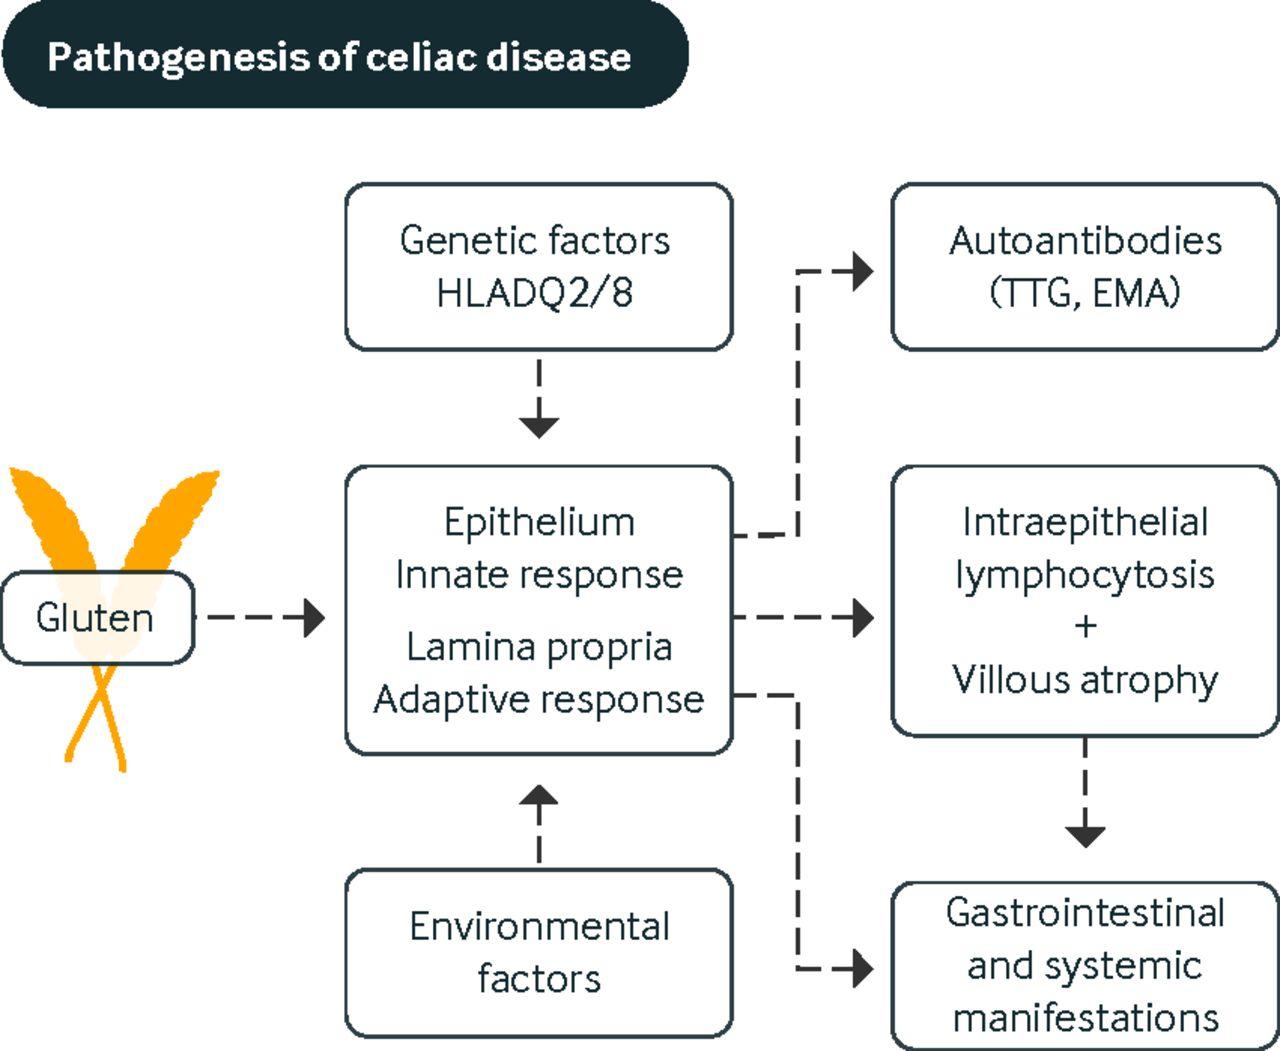 celiac disease and non-celiac gluten sensitivity | the bmj